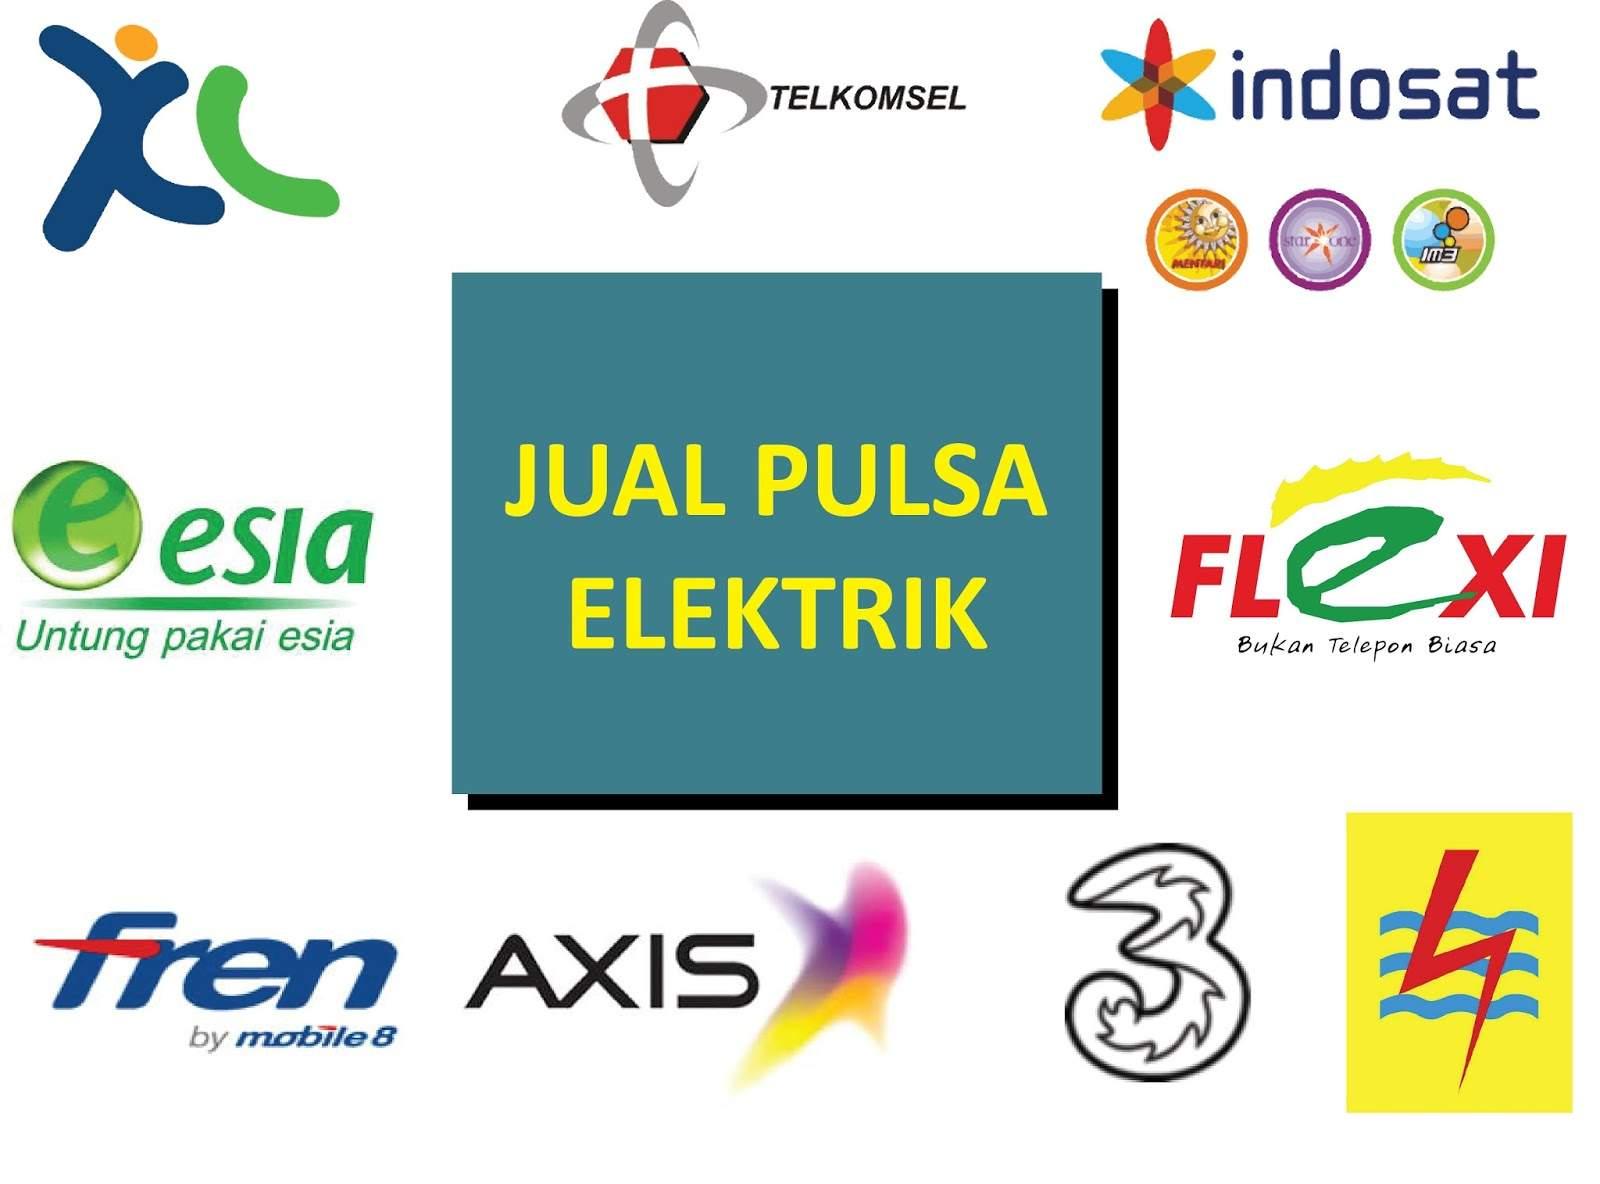 Dealer Pulsa Elektrik